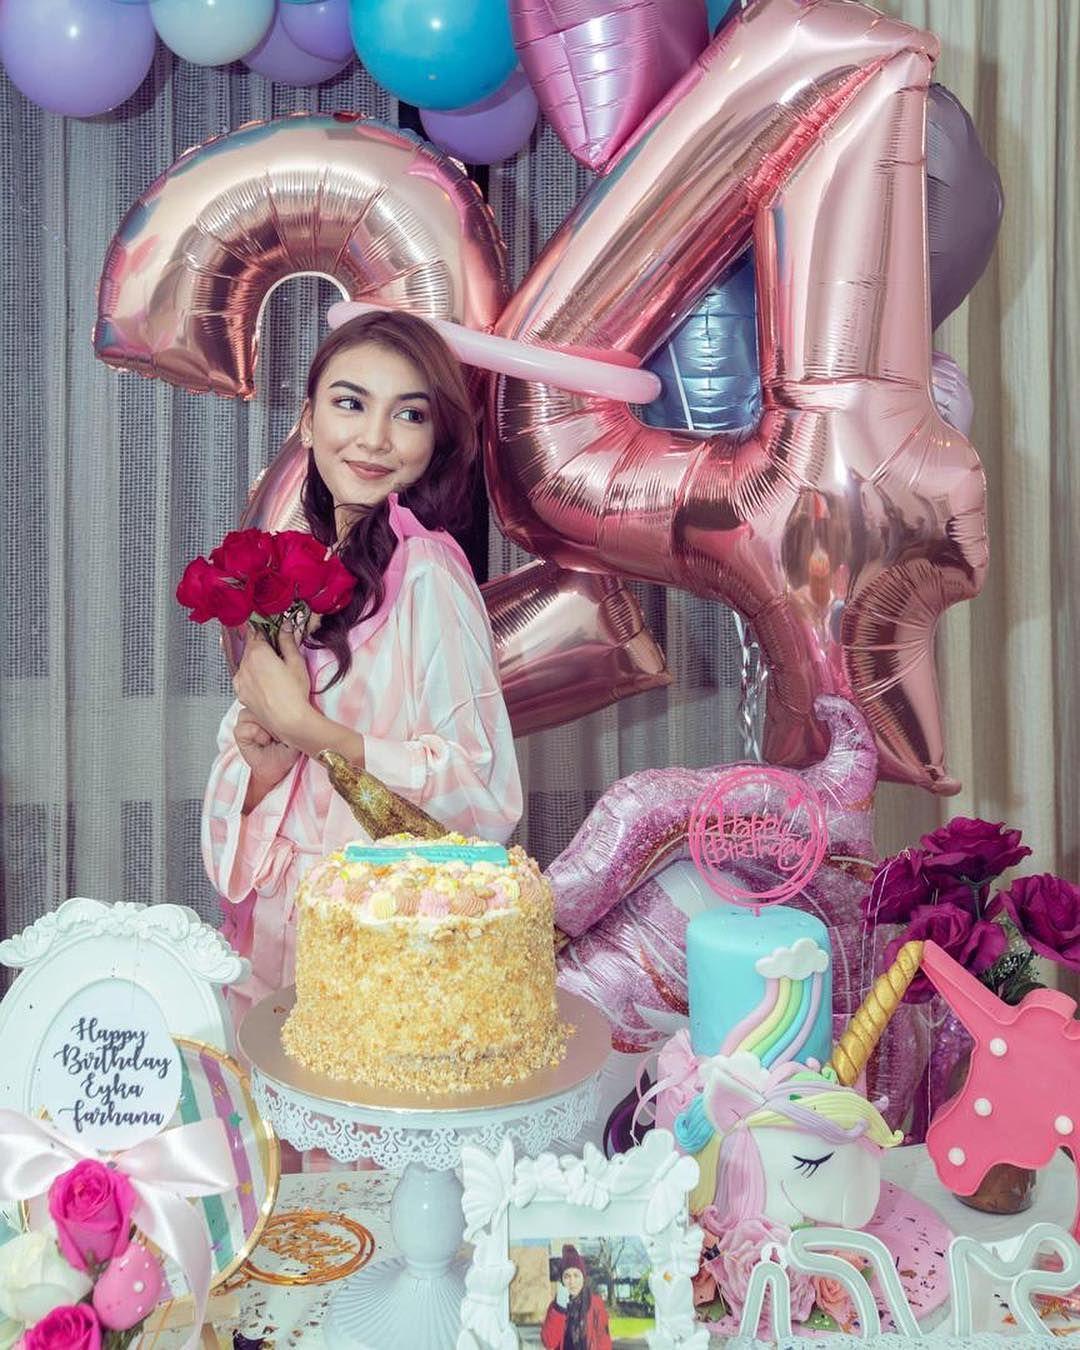 Eyka farhanas 24th birthday celebration